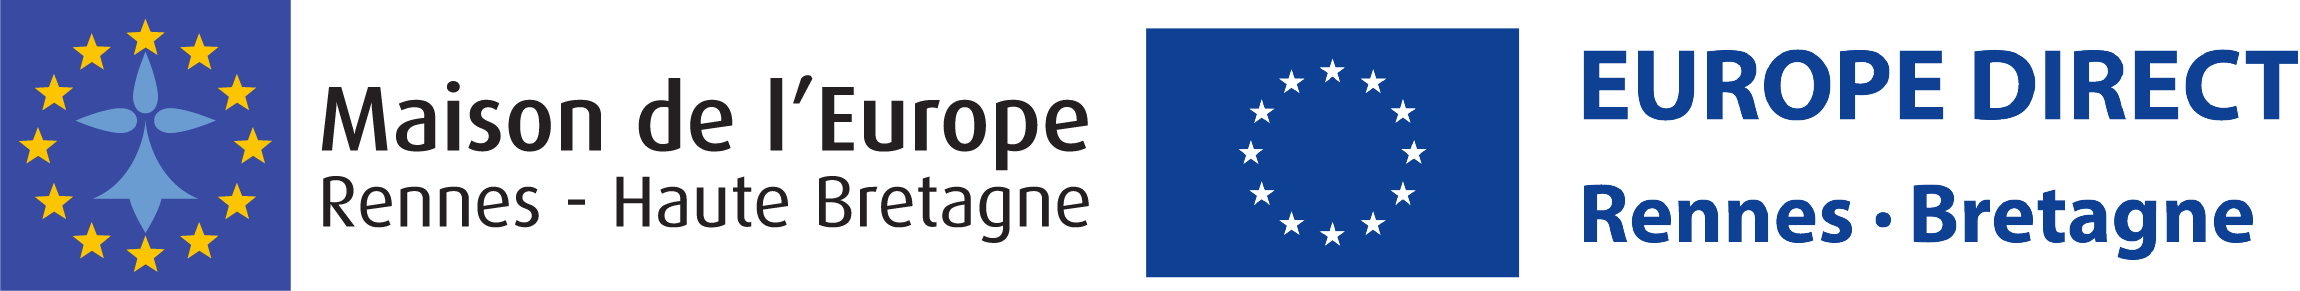 5 Bandeau Mde Cied Long (logo Bleu Texte Bleu Et Noir)